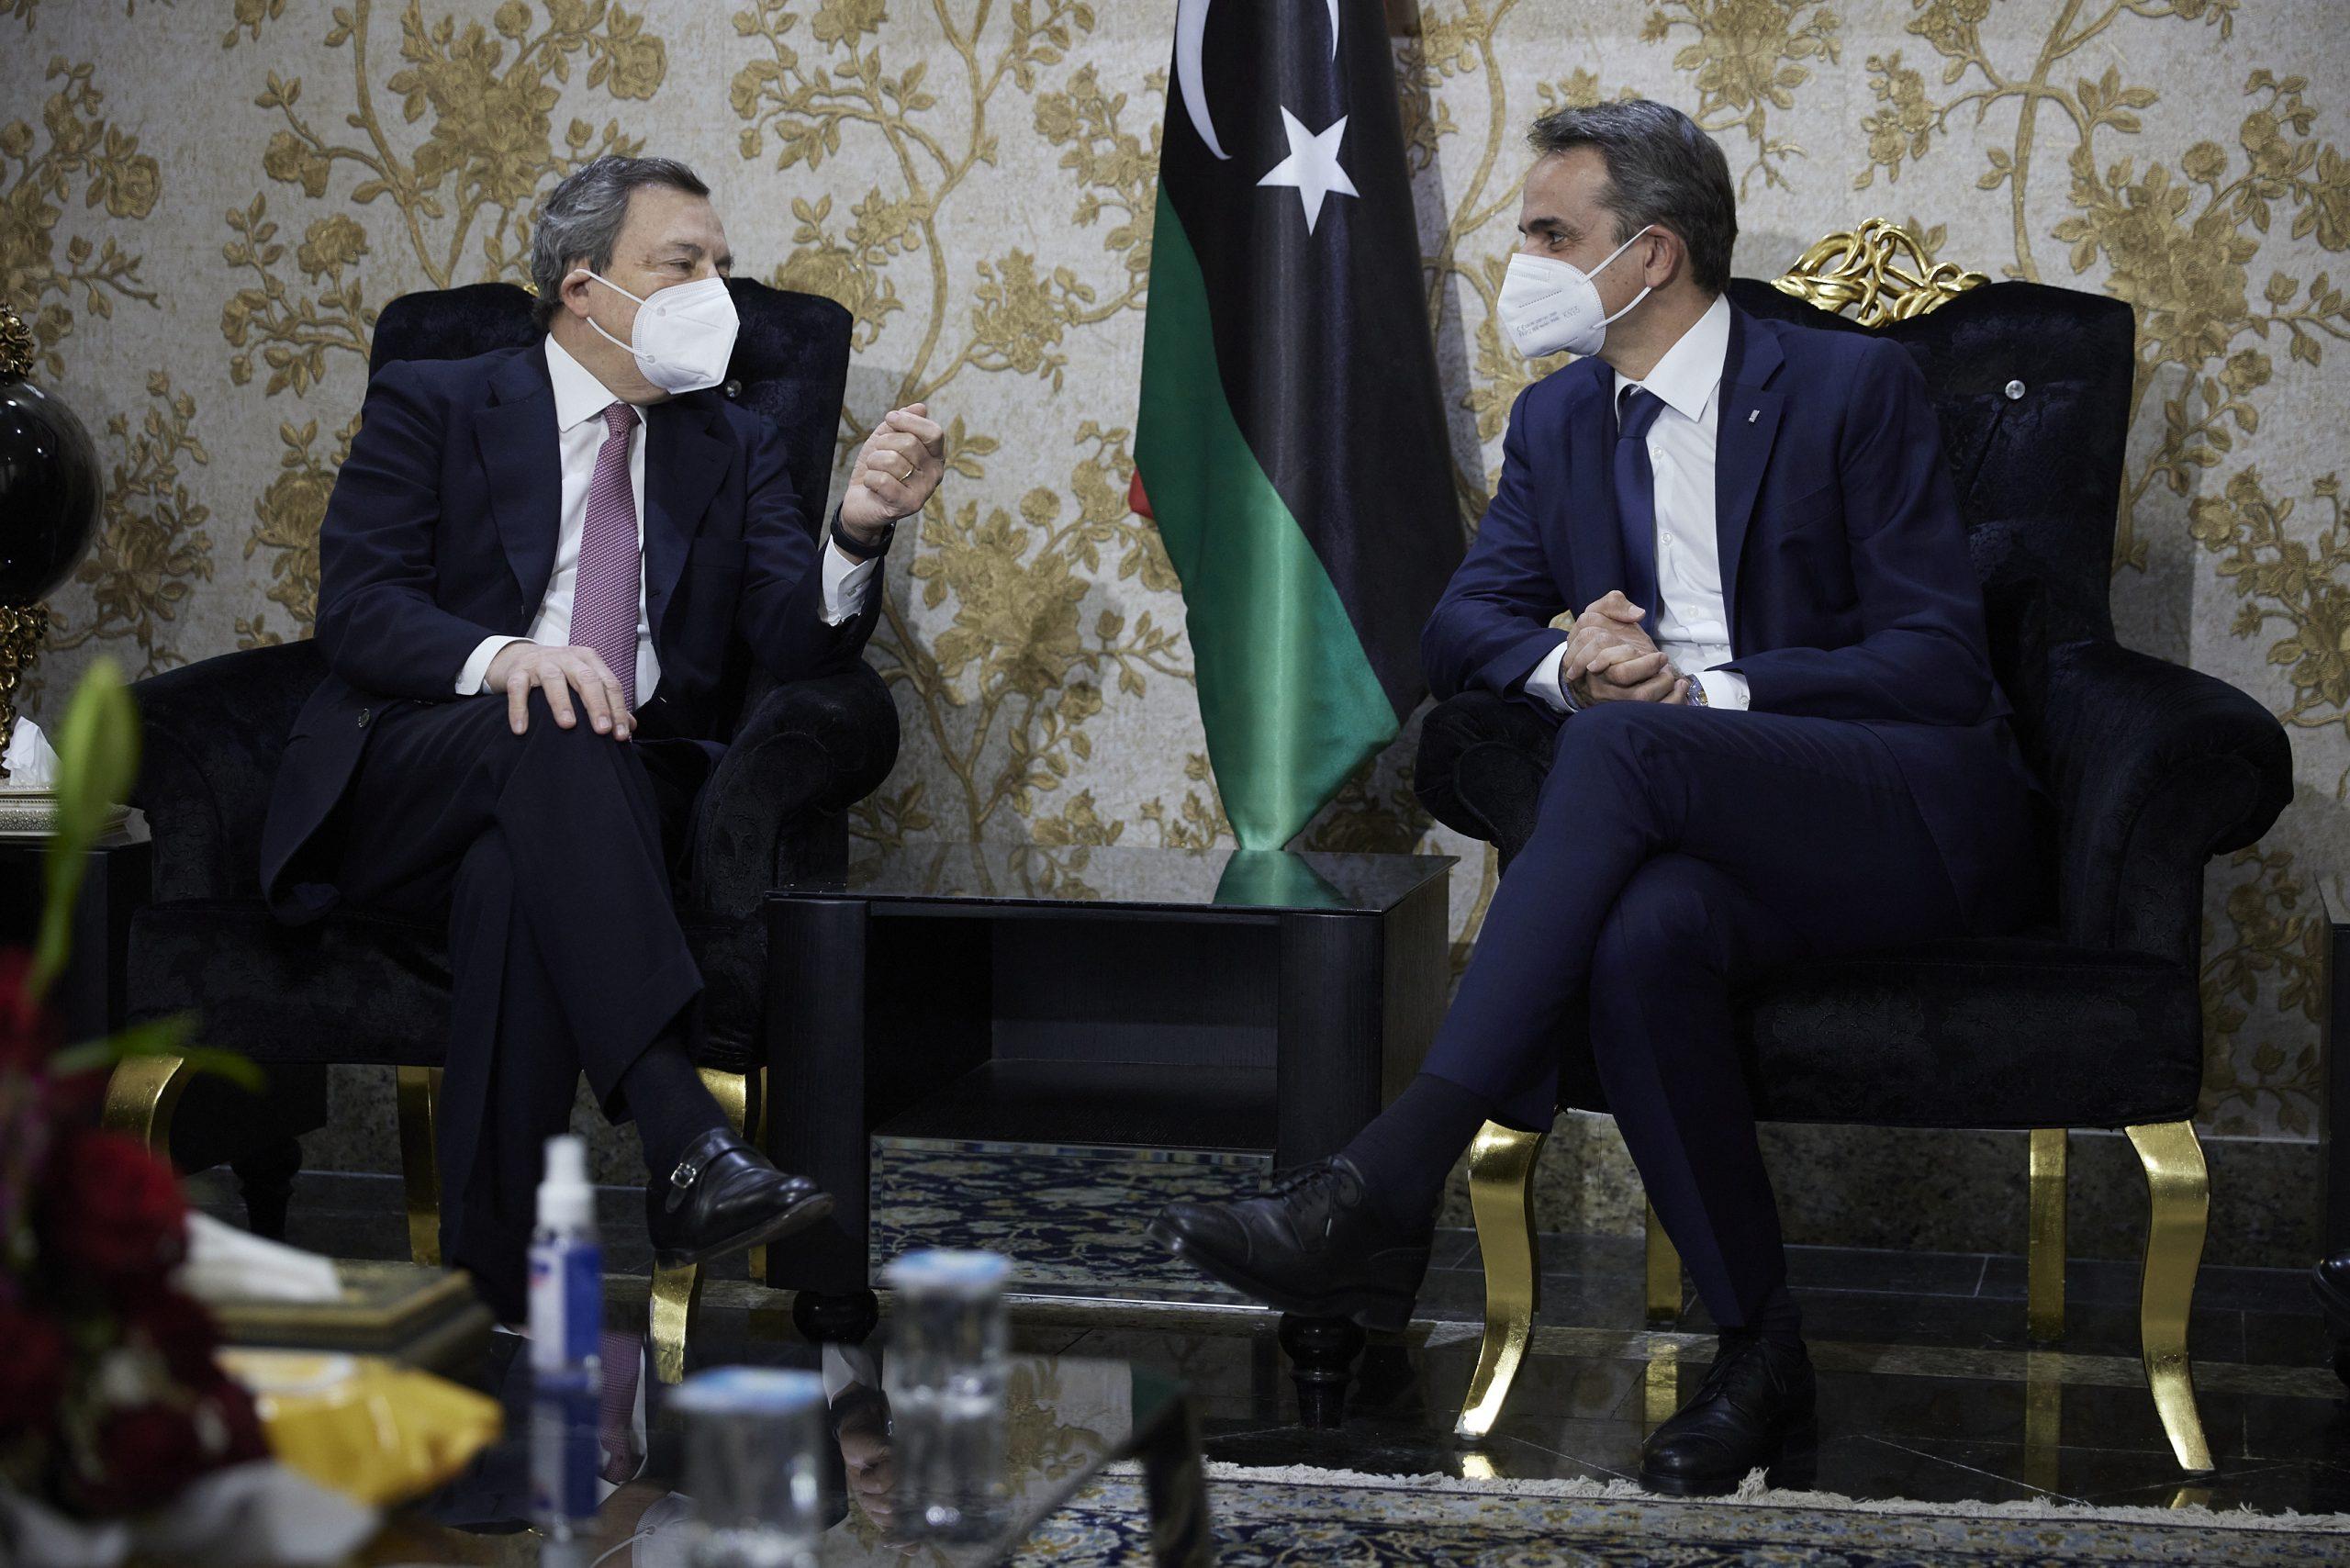 Mitsotakis, Draghi discuss EU efforts to stabilize Libya on sideline of Tripoli visit | eKathimerini.com